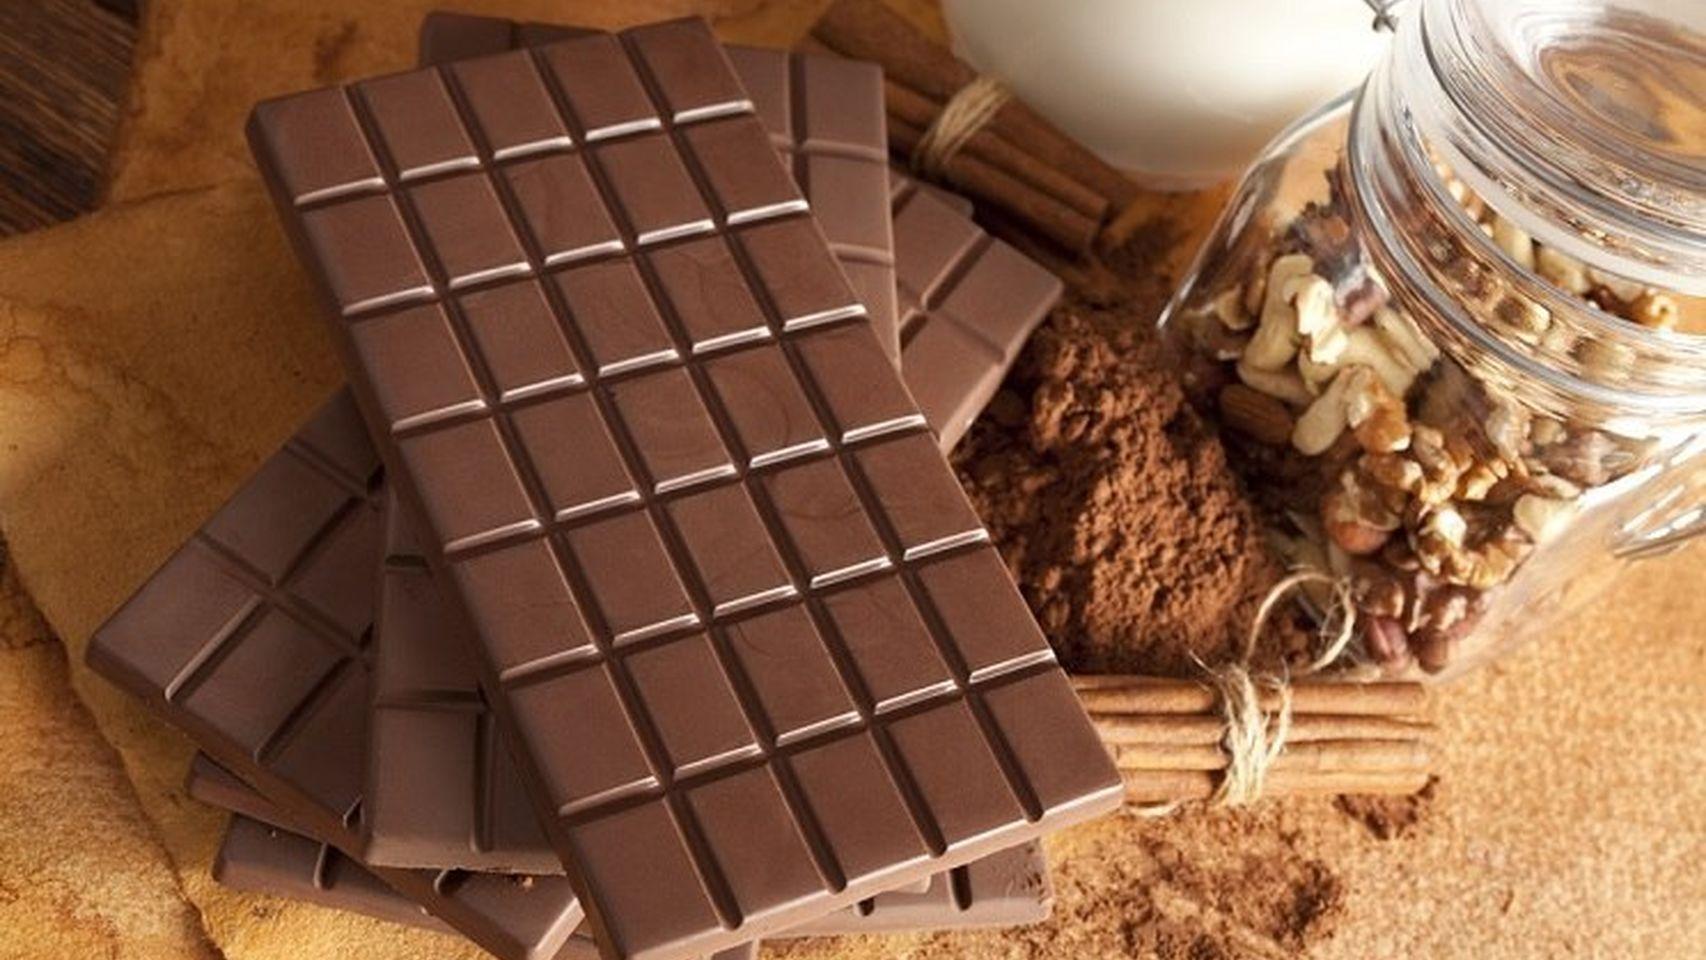 Ladrillo de chocolate GRATIS en guipuzkoa